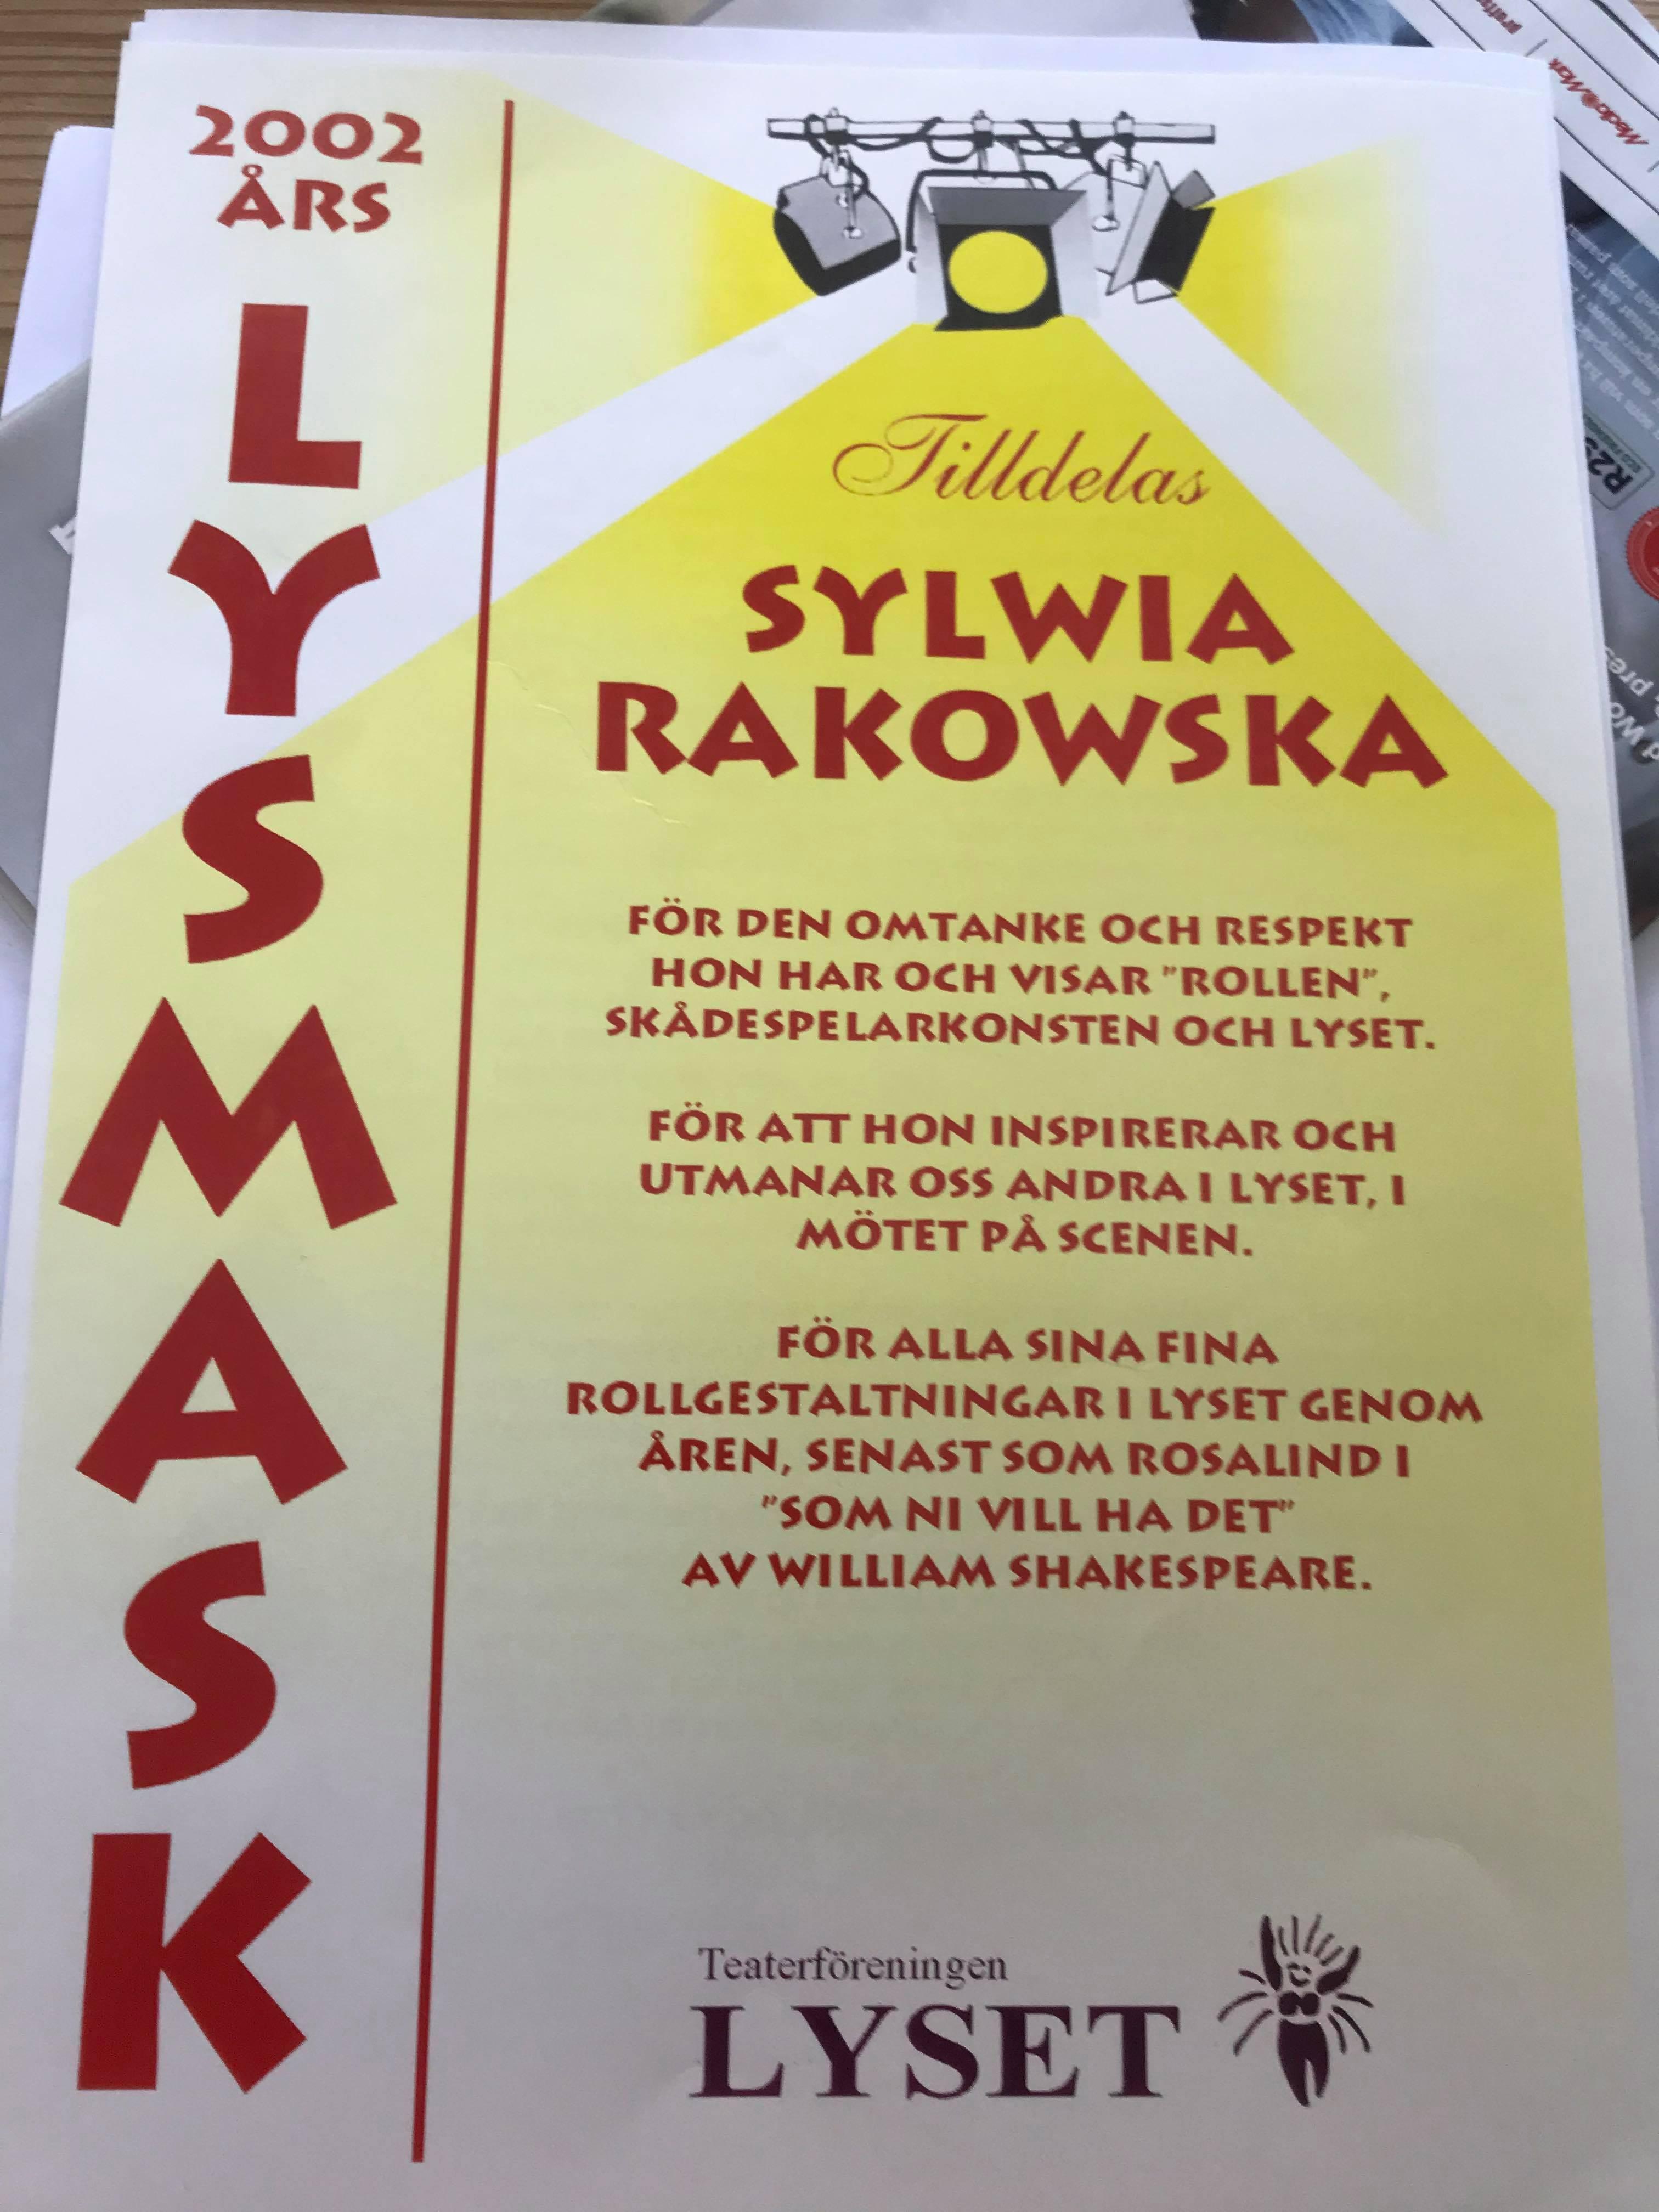 Sylwia Rakowska